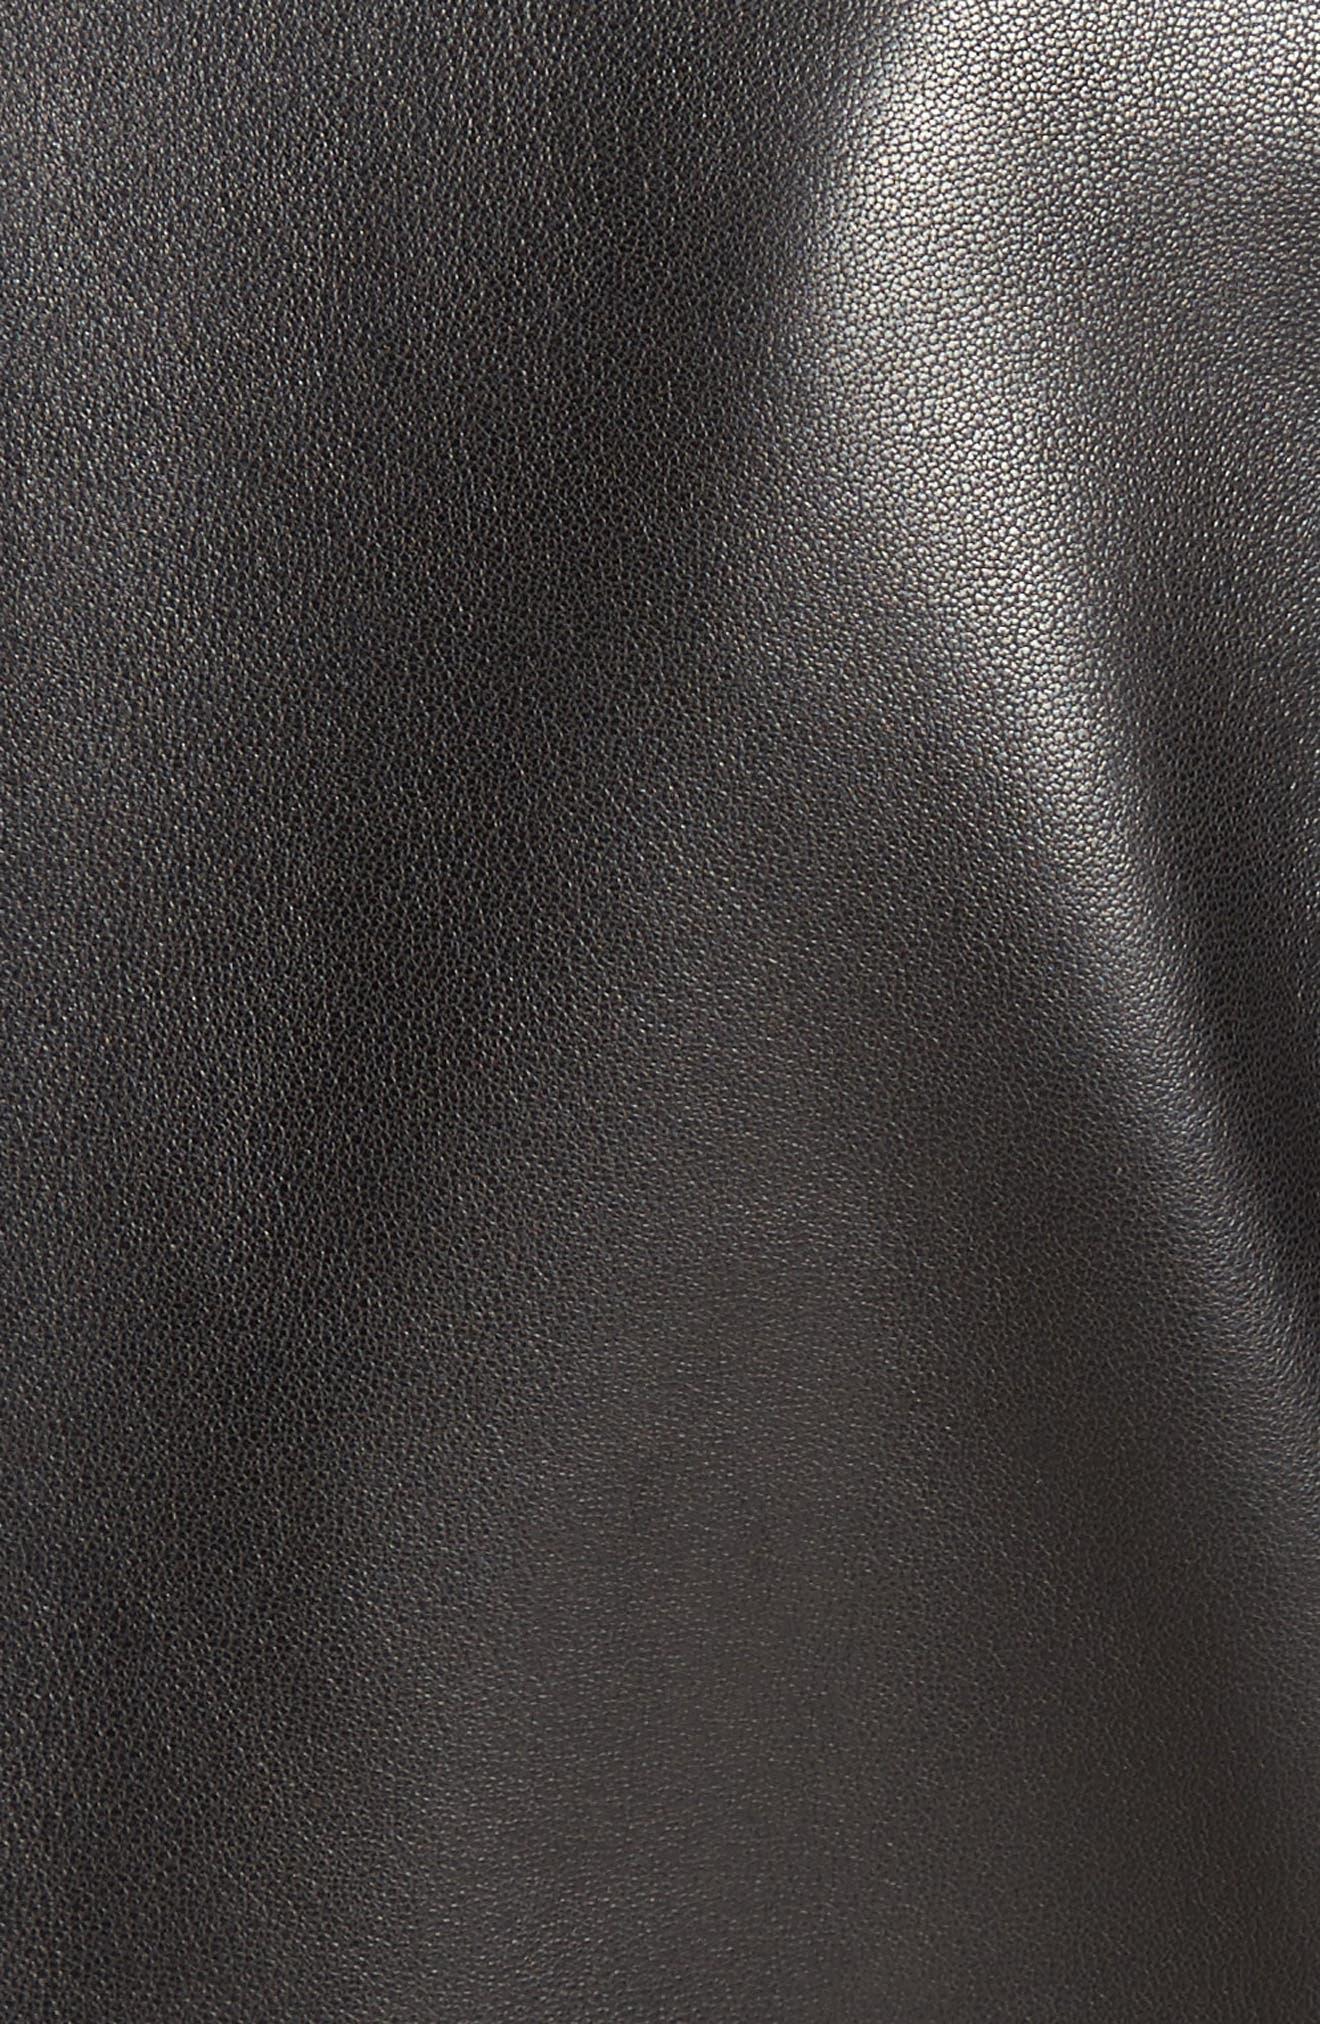 Asymmetrical Zip Leather Jacket,                             Alternate thumbnail 6, color,                             001